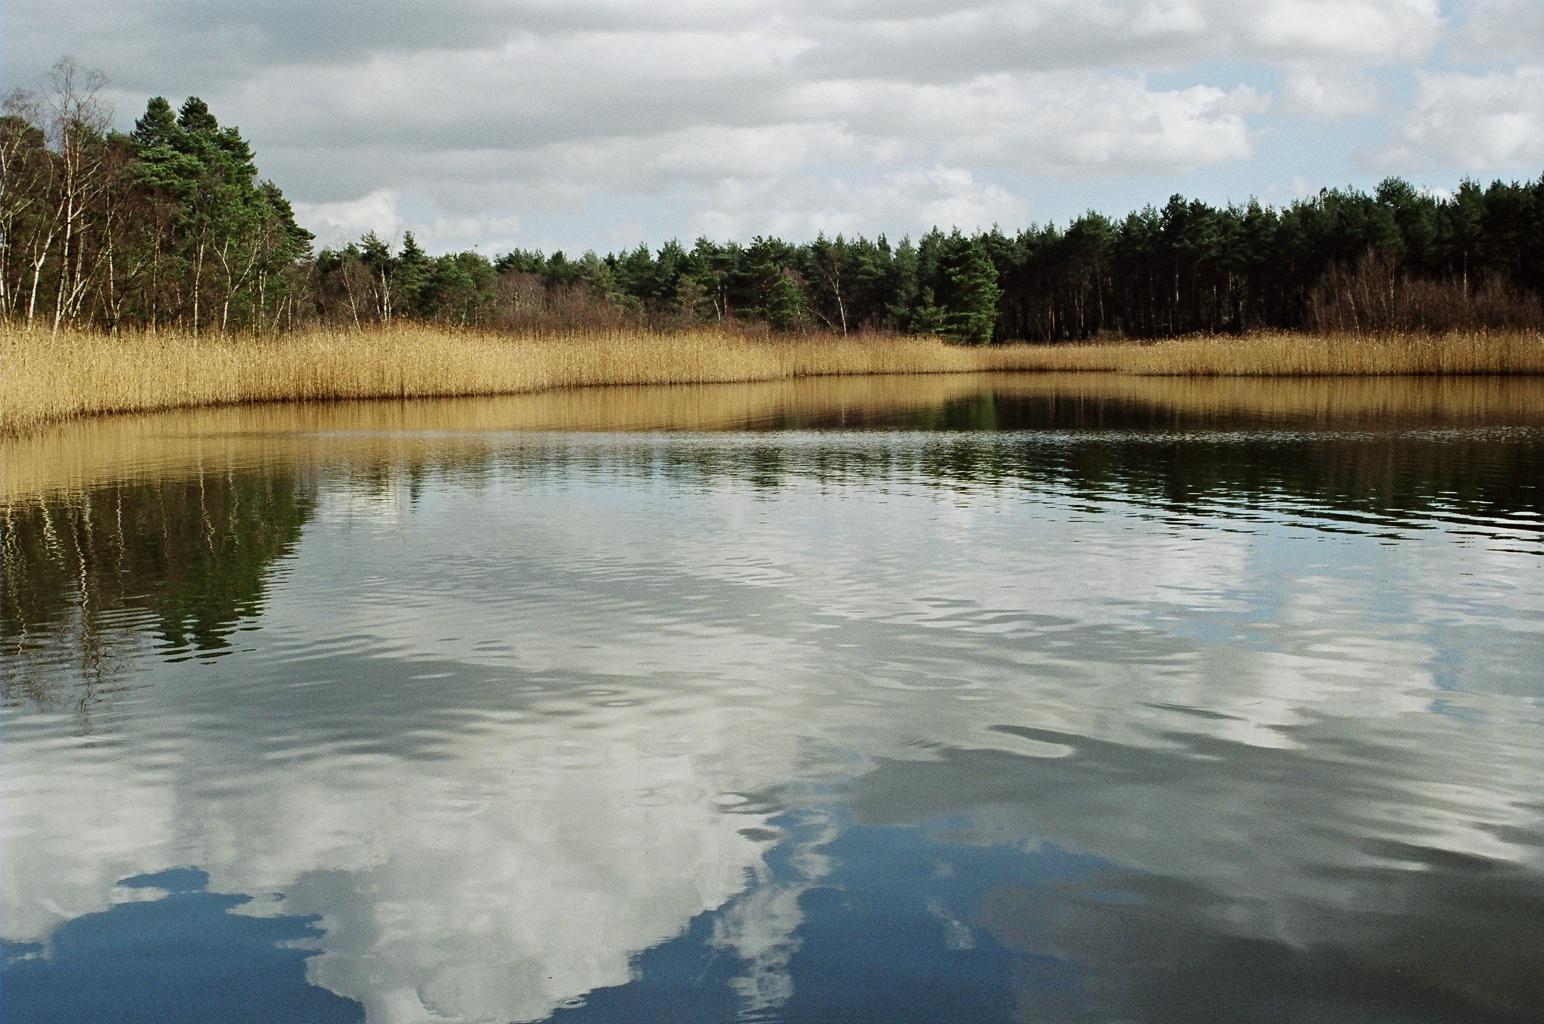 Inspirational Synonym for Pond